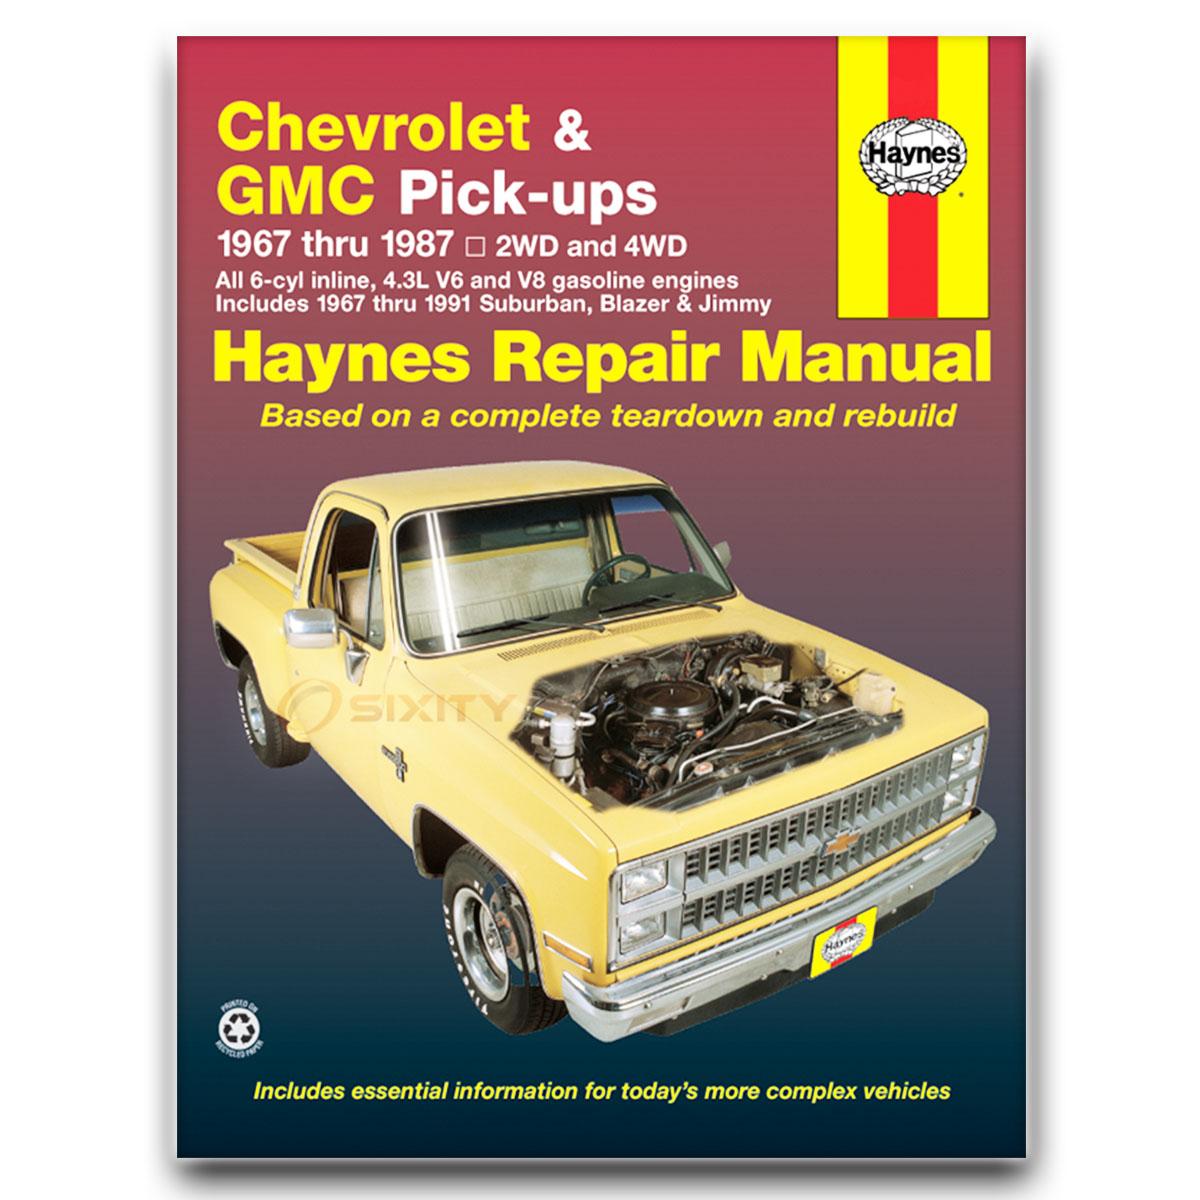 Gmc c25 c2500 pickup haynes repair manual base shop service garage book xz